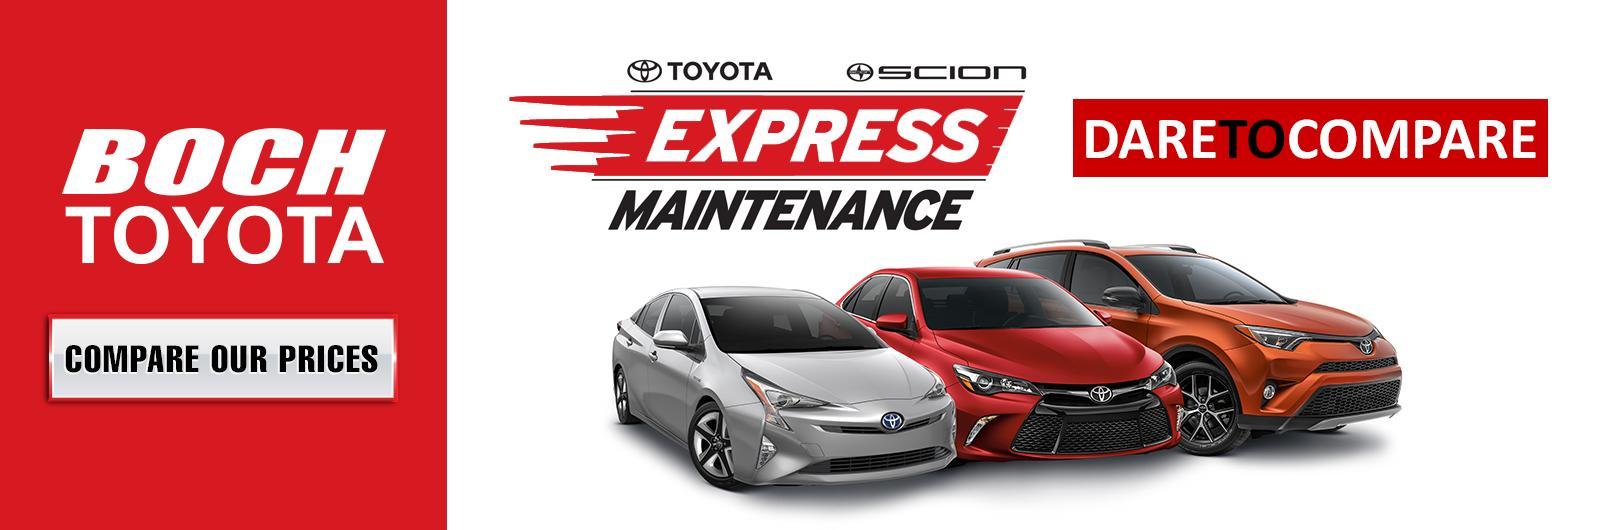 Toyota Dealers Ma >> Toyota Dealers In Ma Car Image Idea